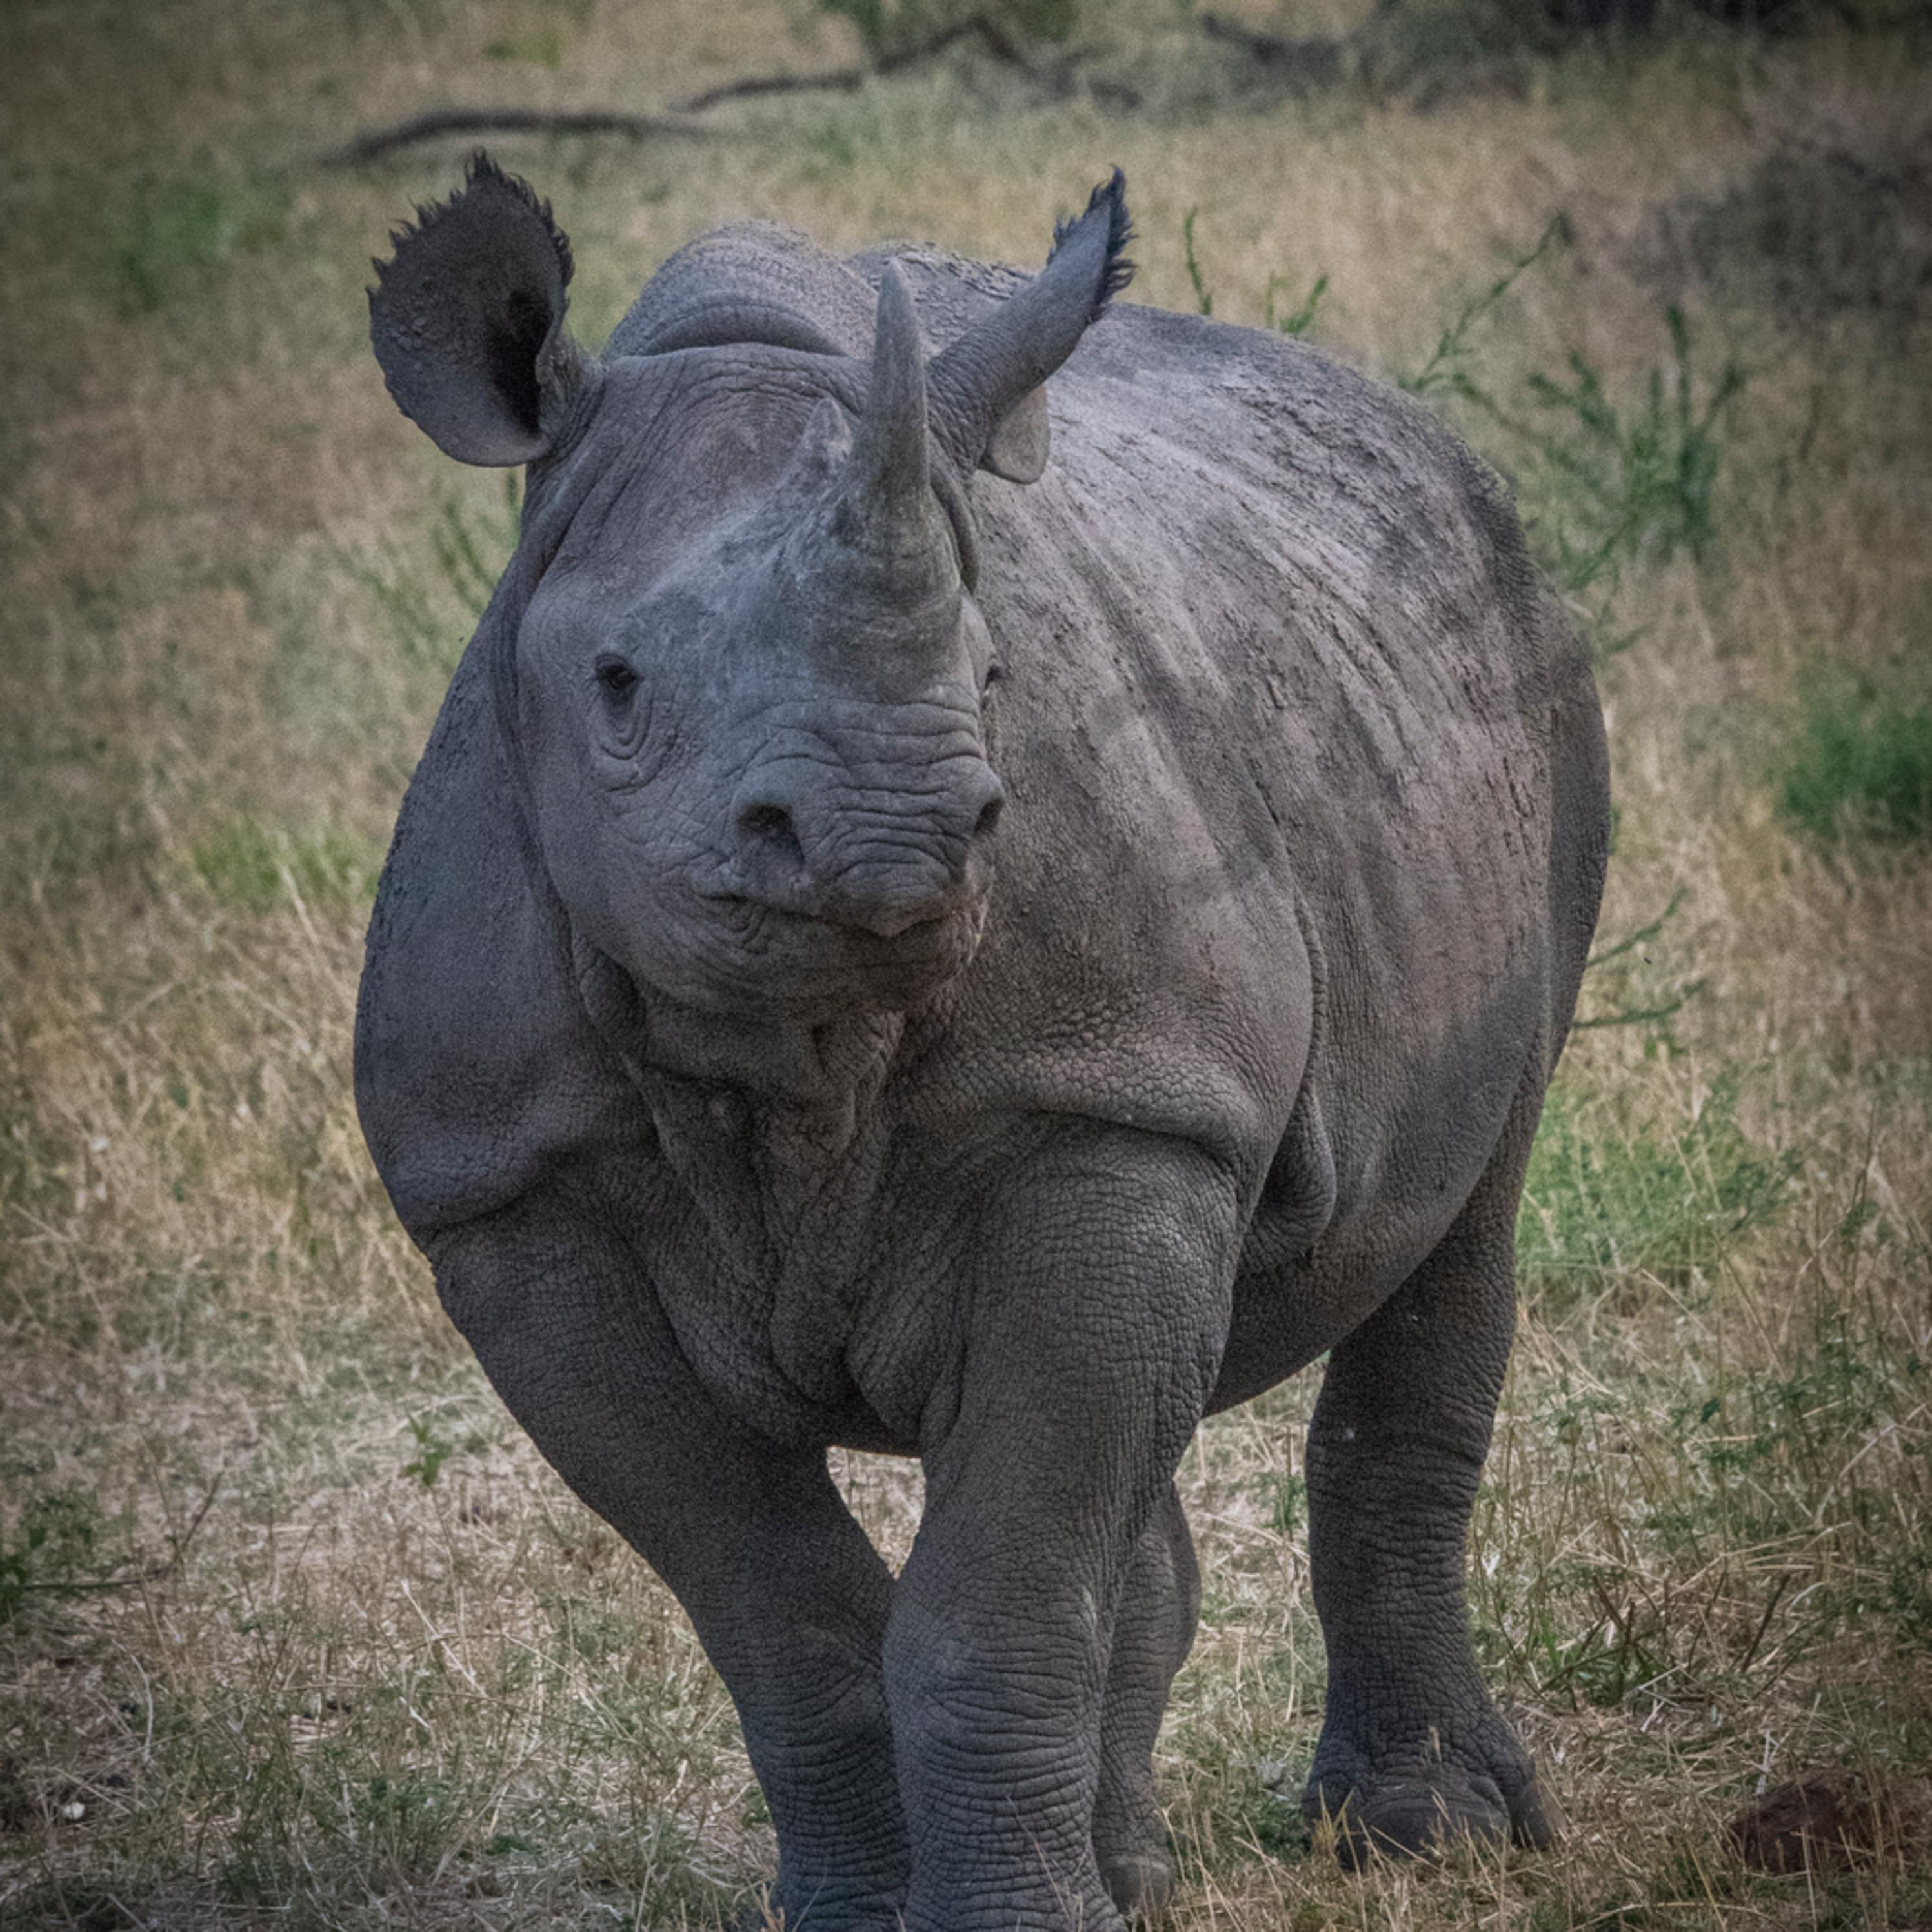 Jps rhino 1 pmrgbk